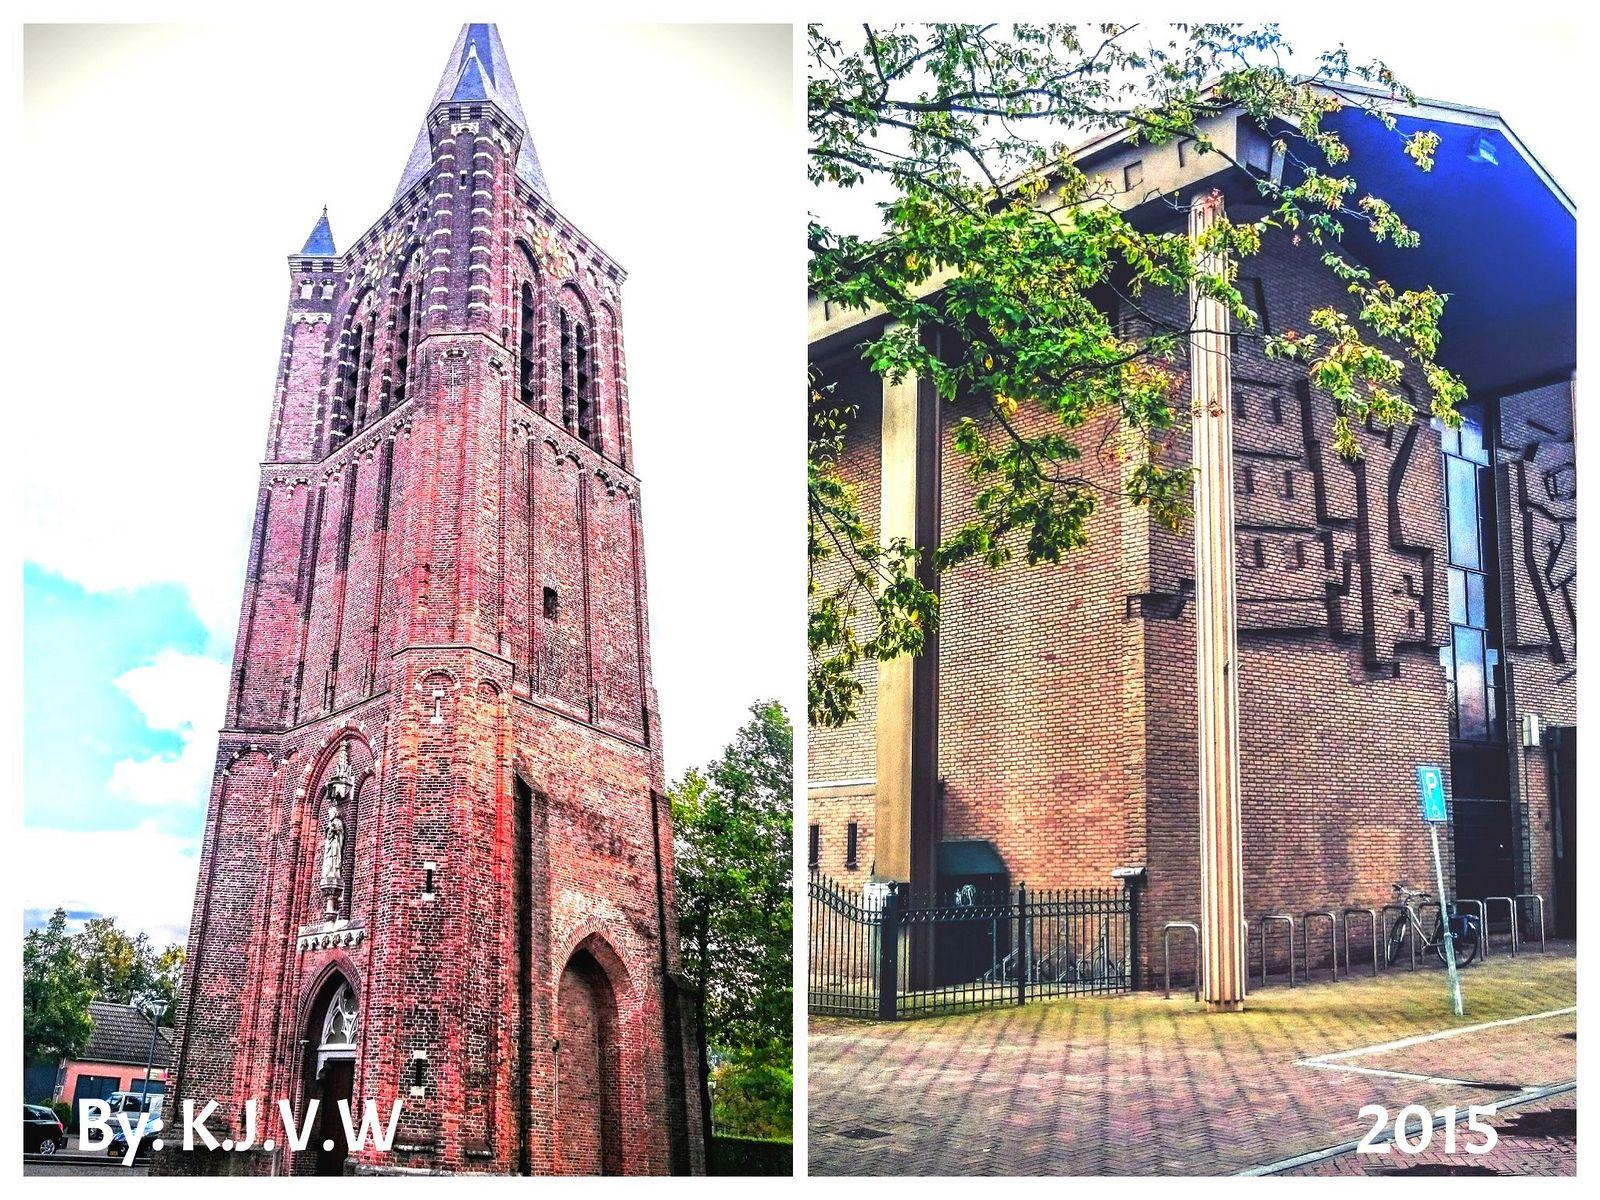 https://flic.kr/p/yErojJ   Old&New  (Old Church Tower  &  New Church Building) -Son  (By:K.J.V.W 2015)